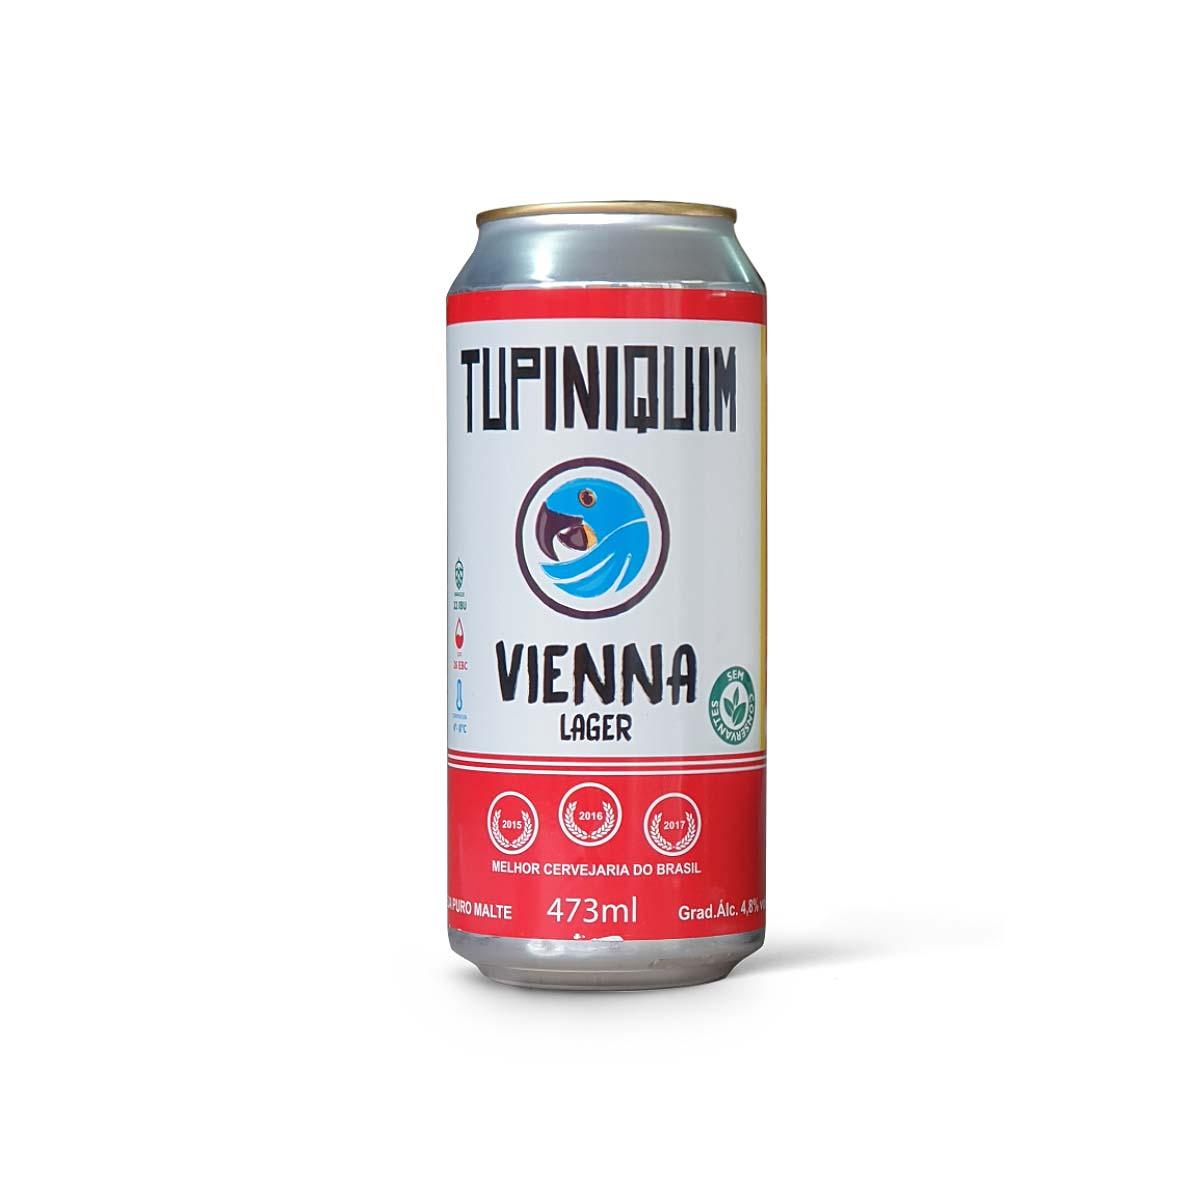 Tupiniquim Vienna Lager 473ml lata